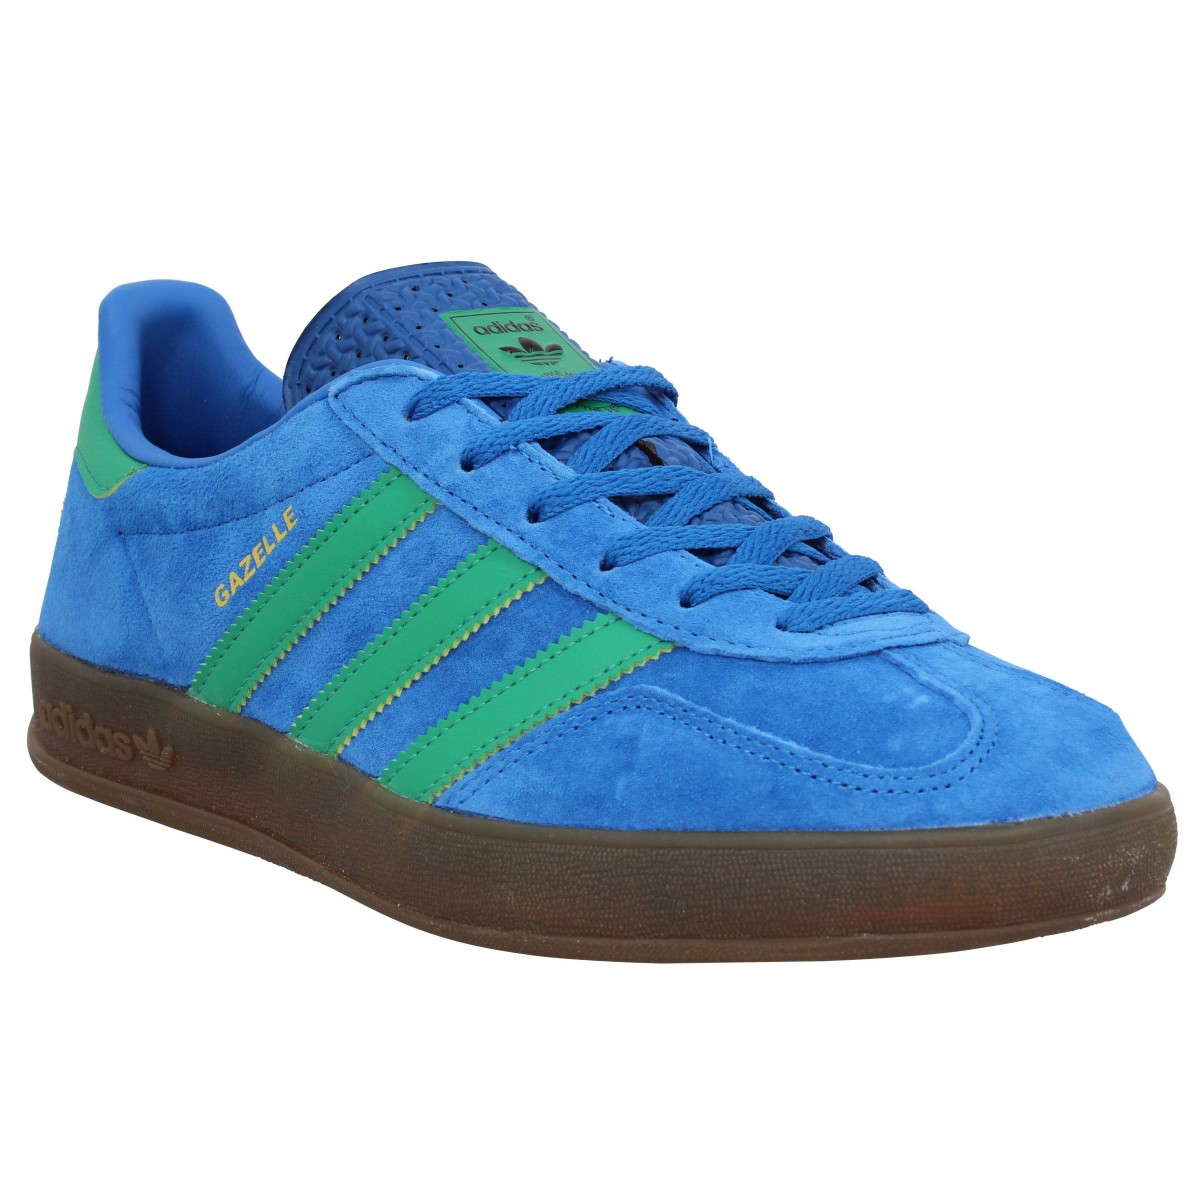 Adidas Gazelle Indoor Velours Homme Bleu Homme Fanny Chaussures